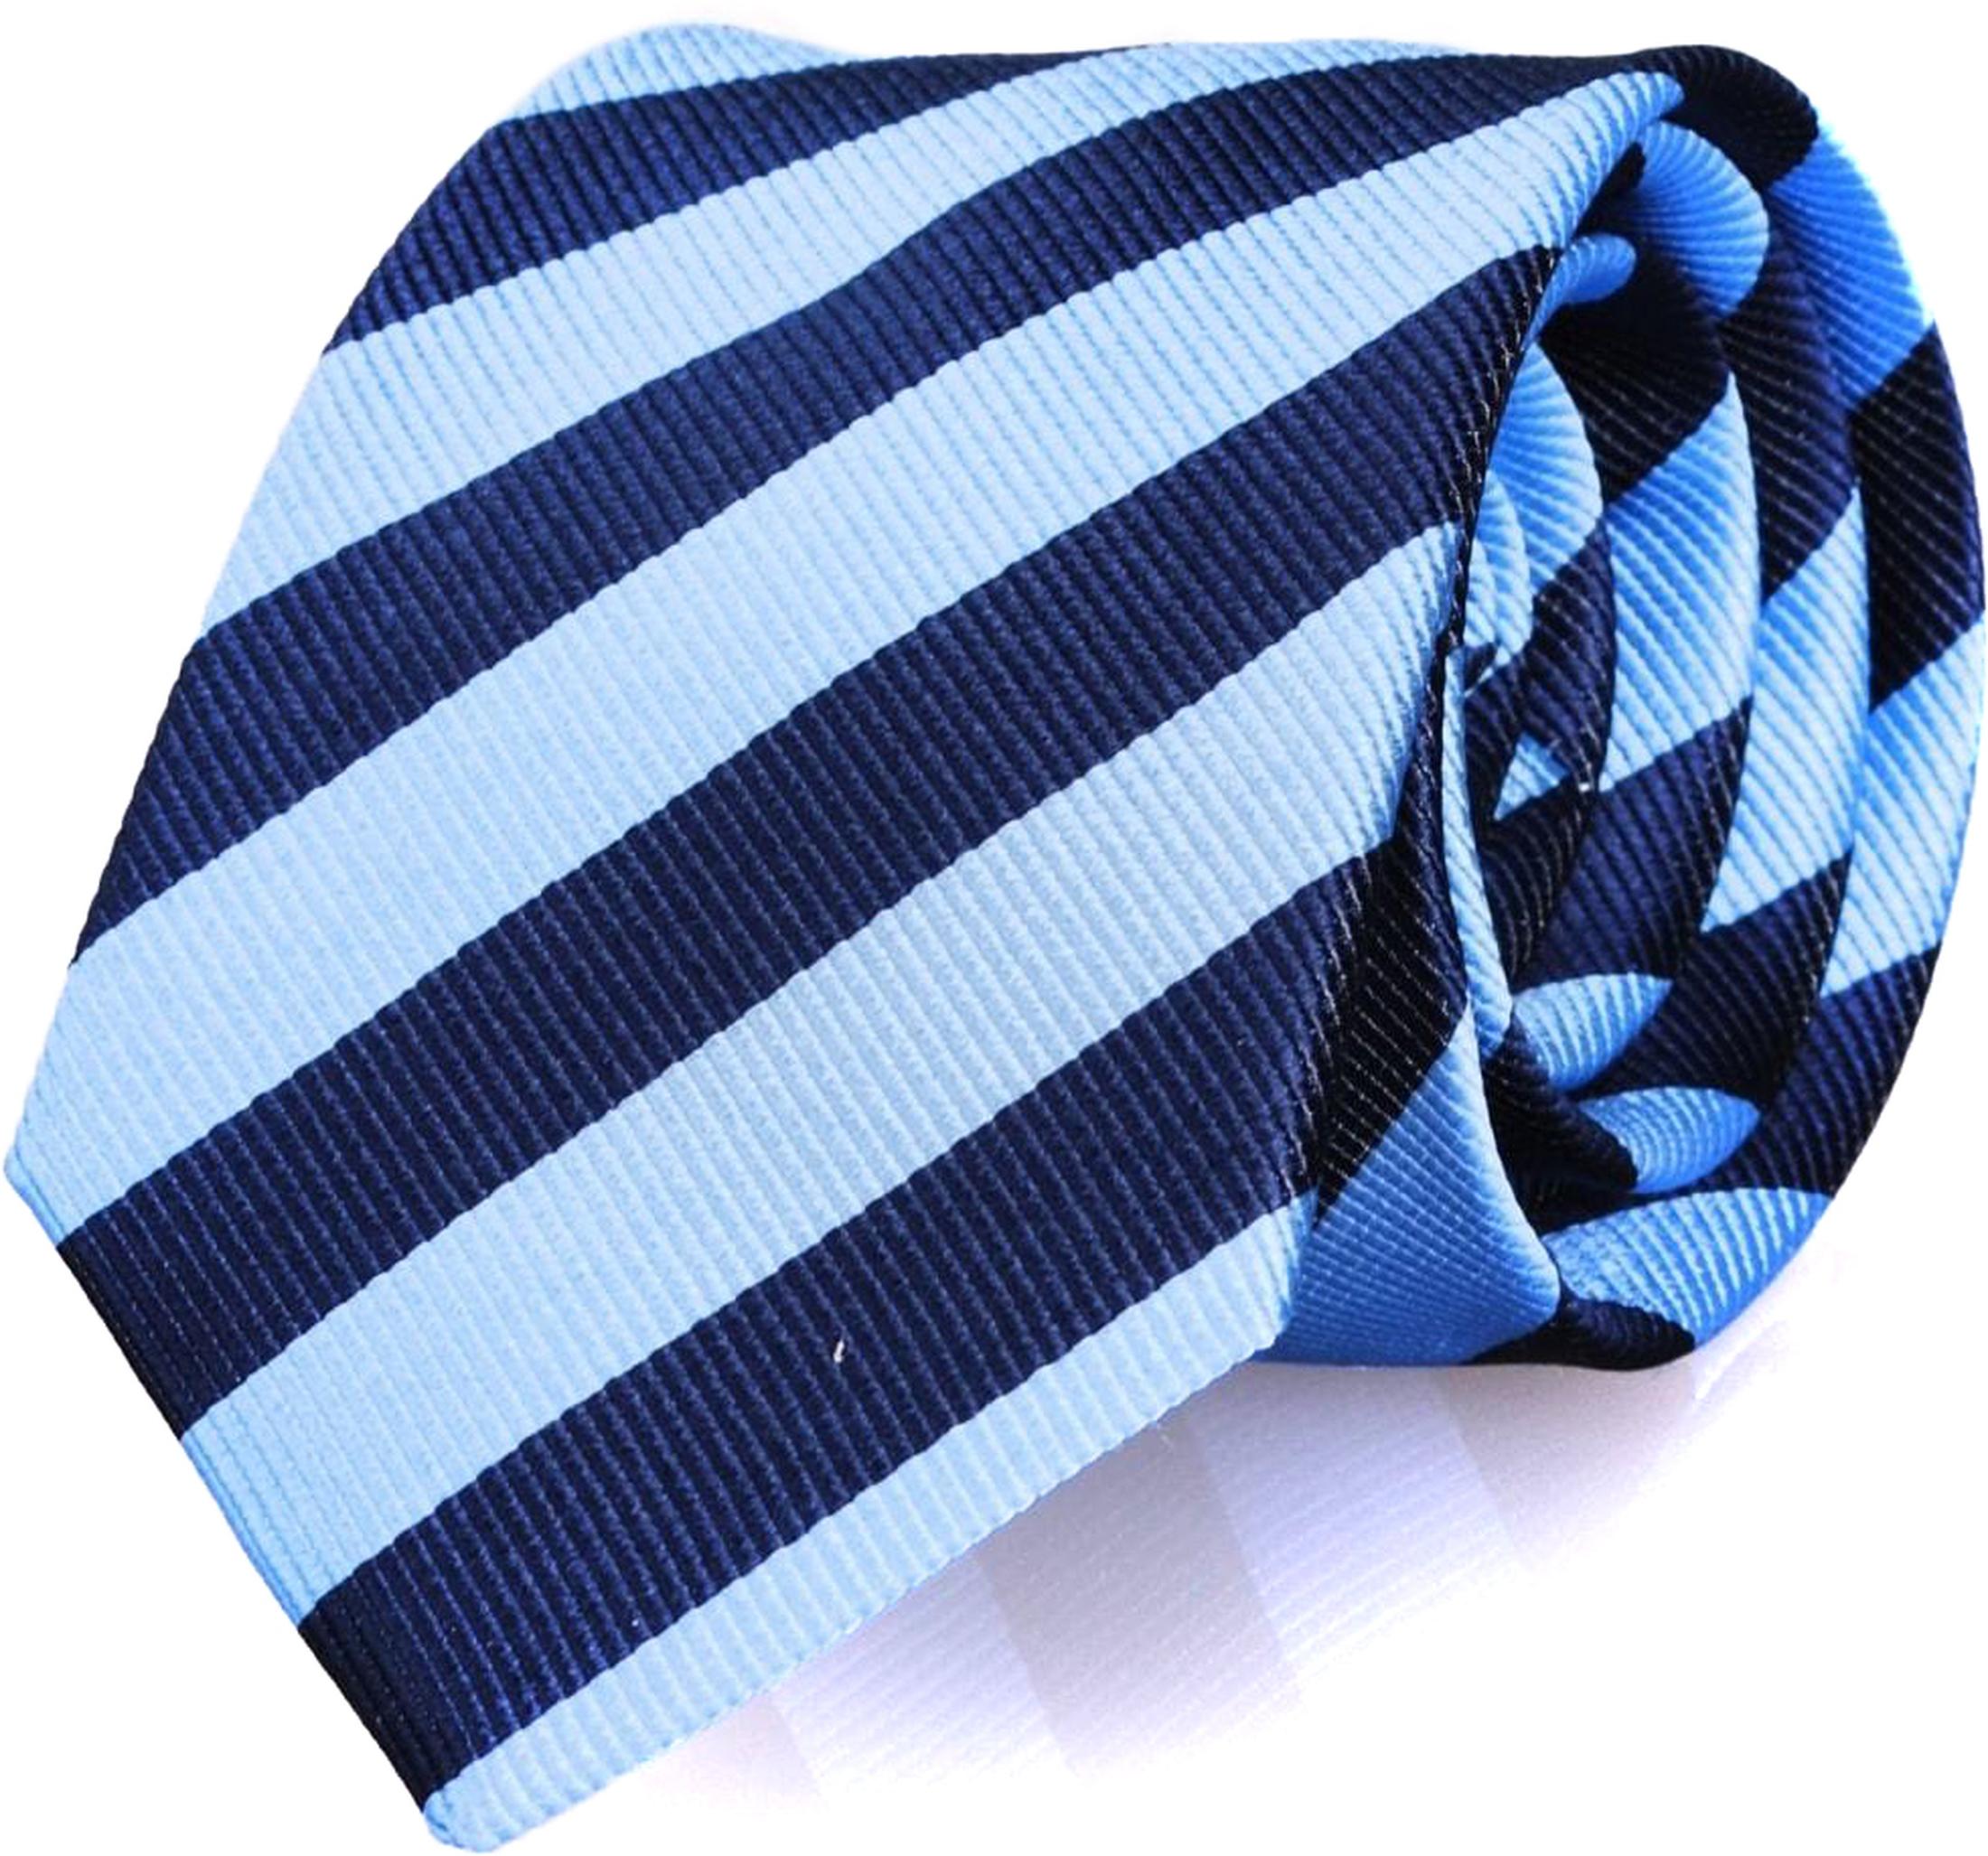 Silk Tie Blue + Navy Striped FD13 foto 0